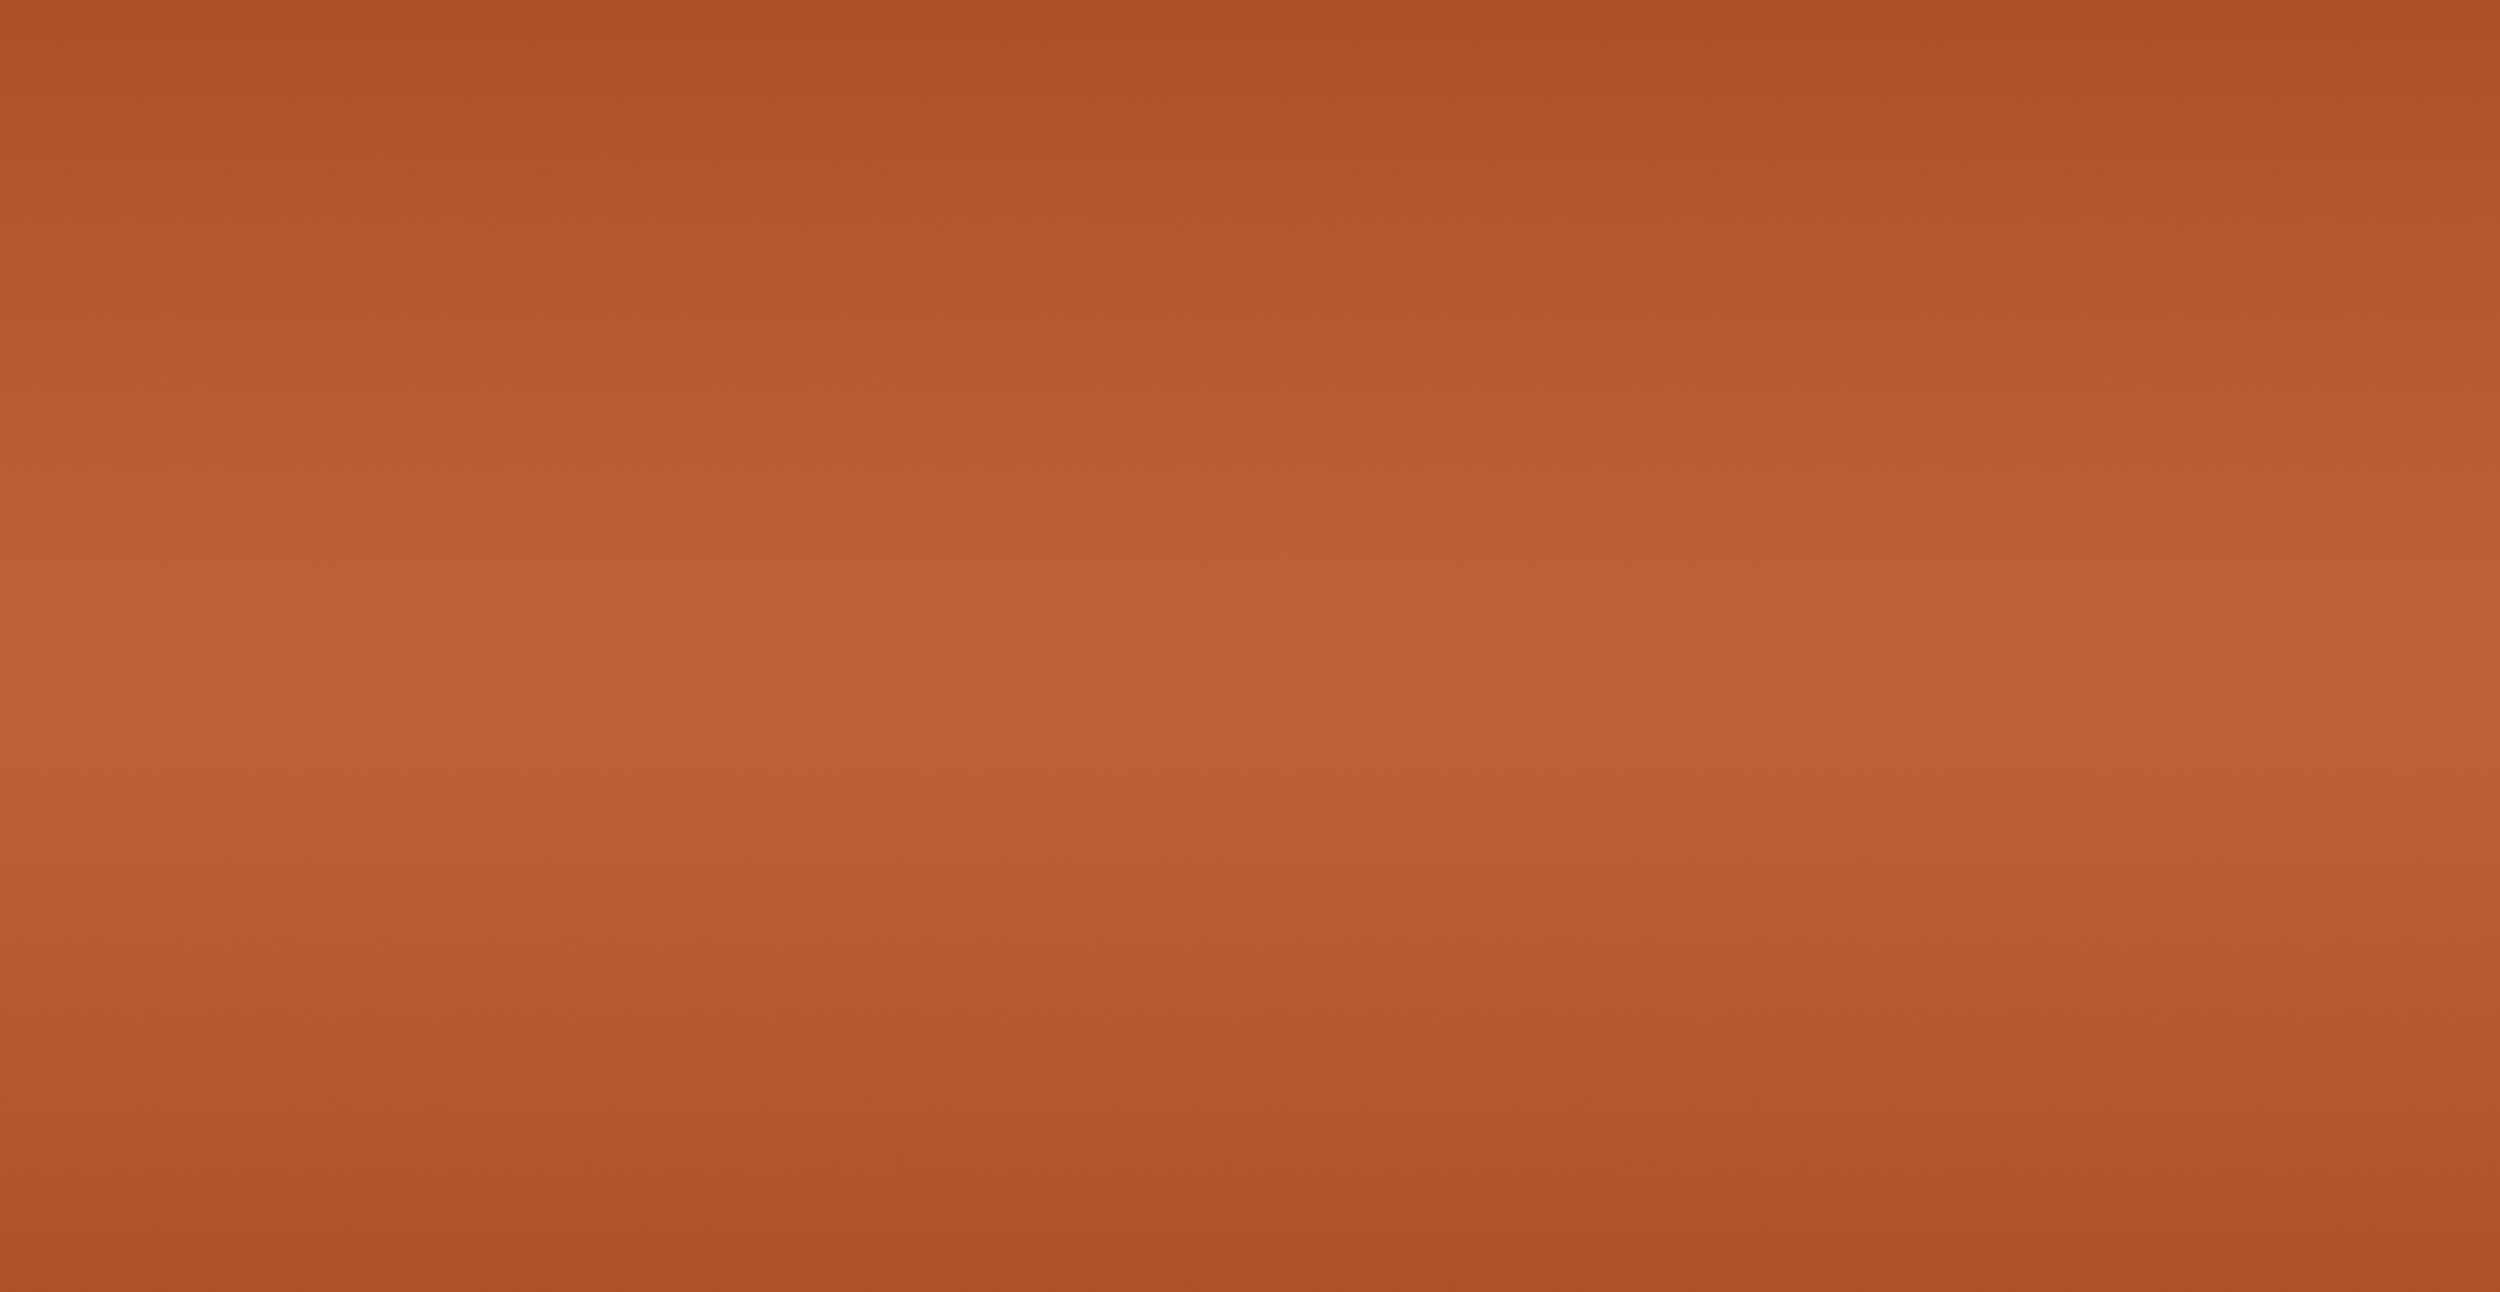 orange-bg-simple.jpg